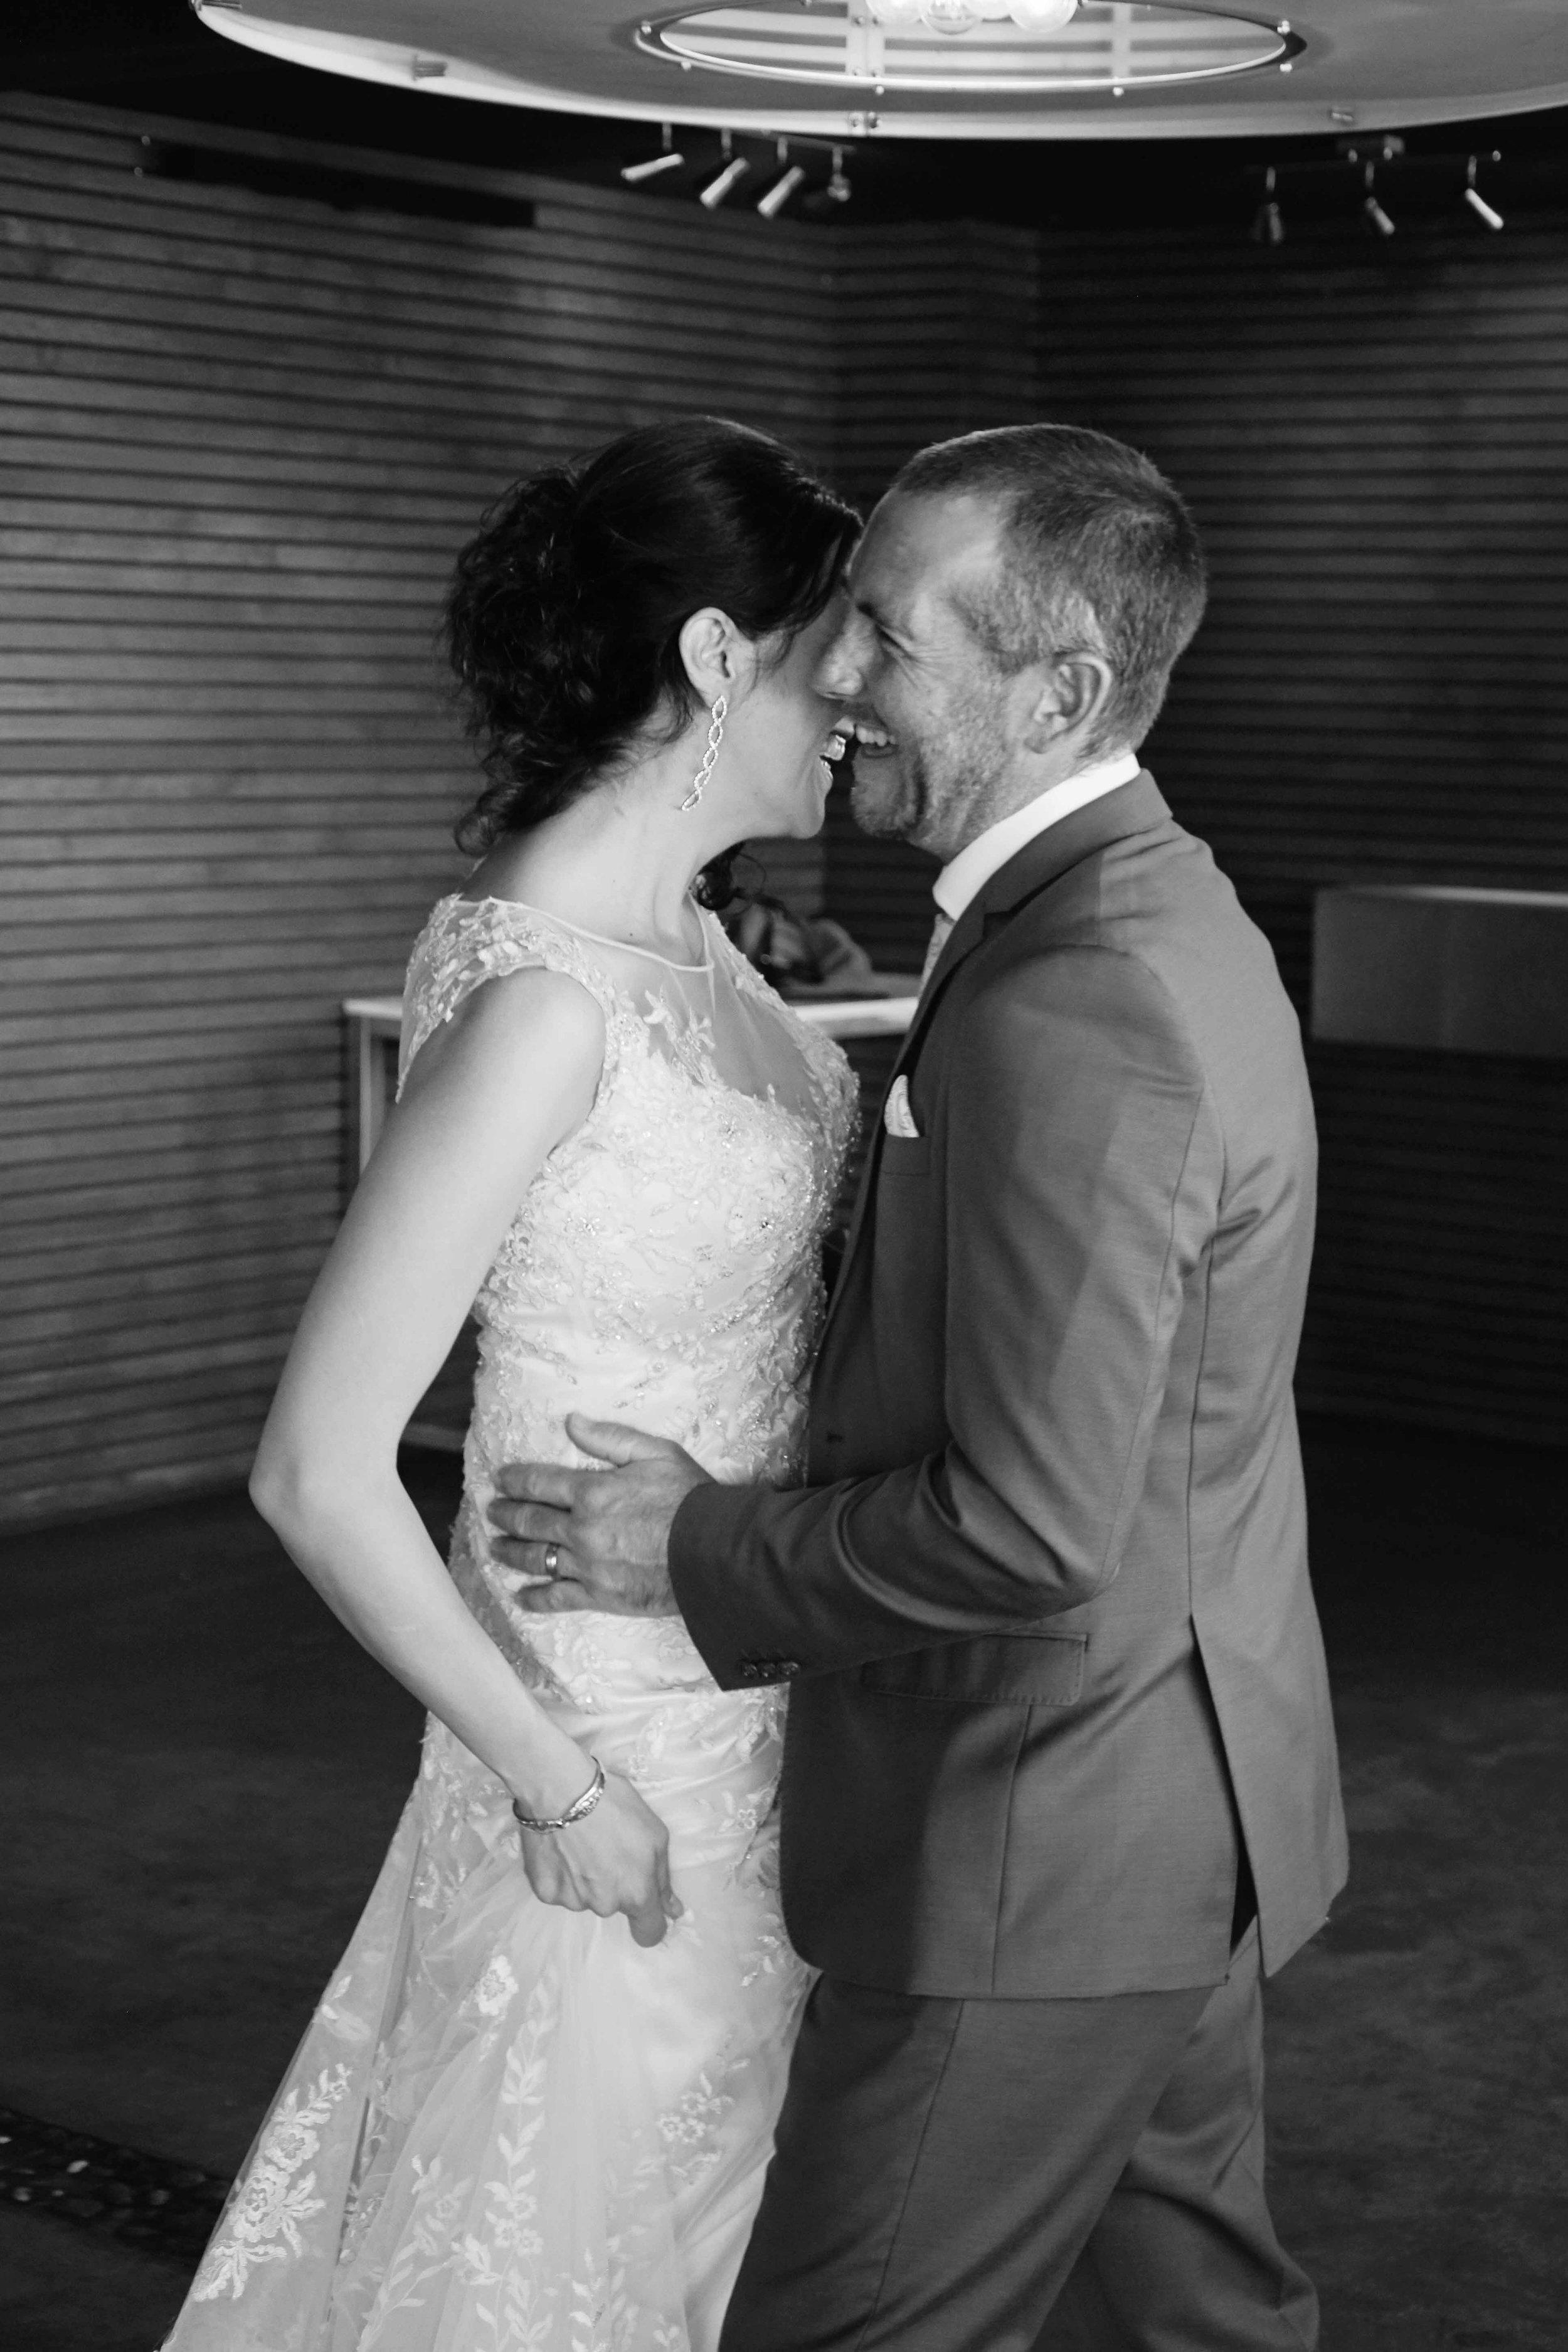 sorrento-wedding-photography-all-smiles-marissa-jade-photography-108.jpg